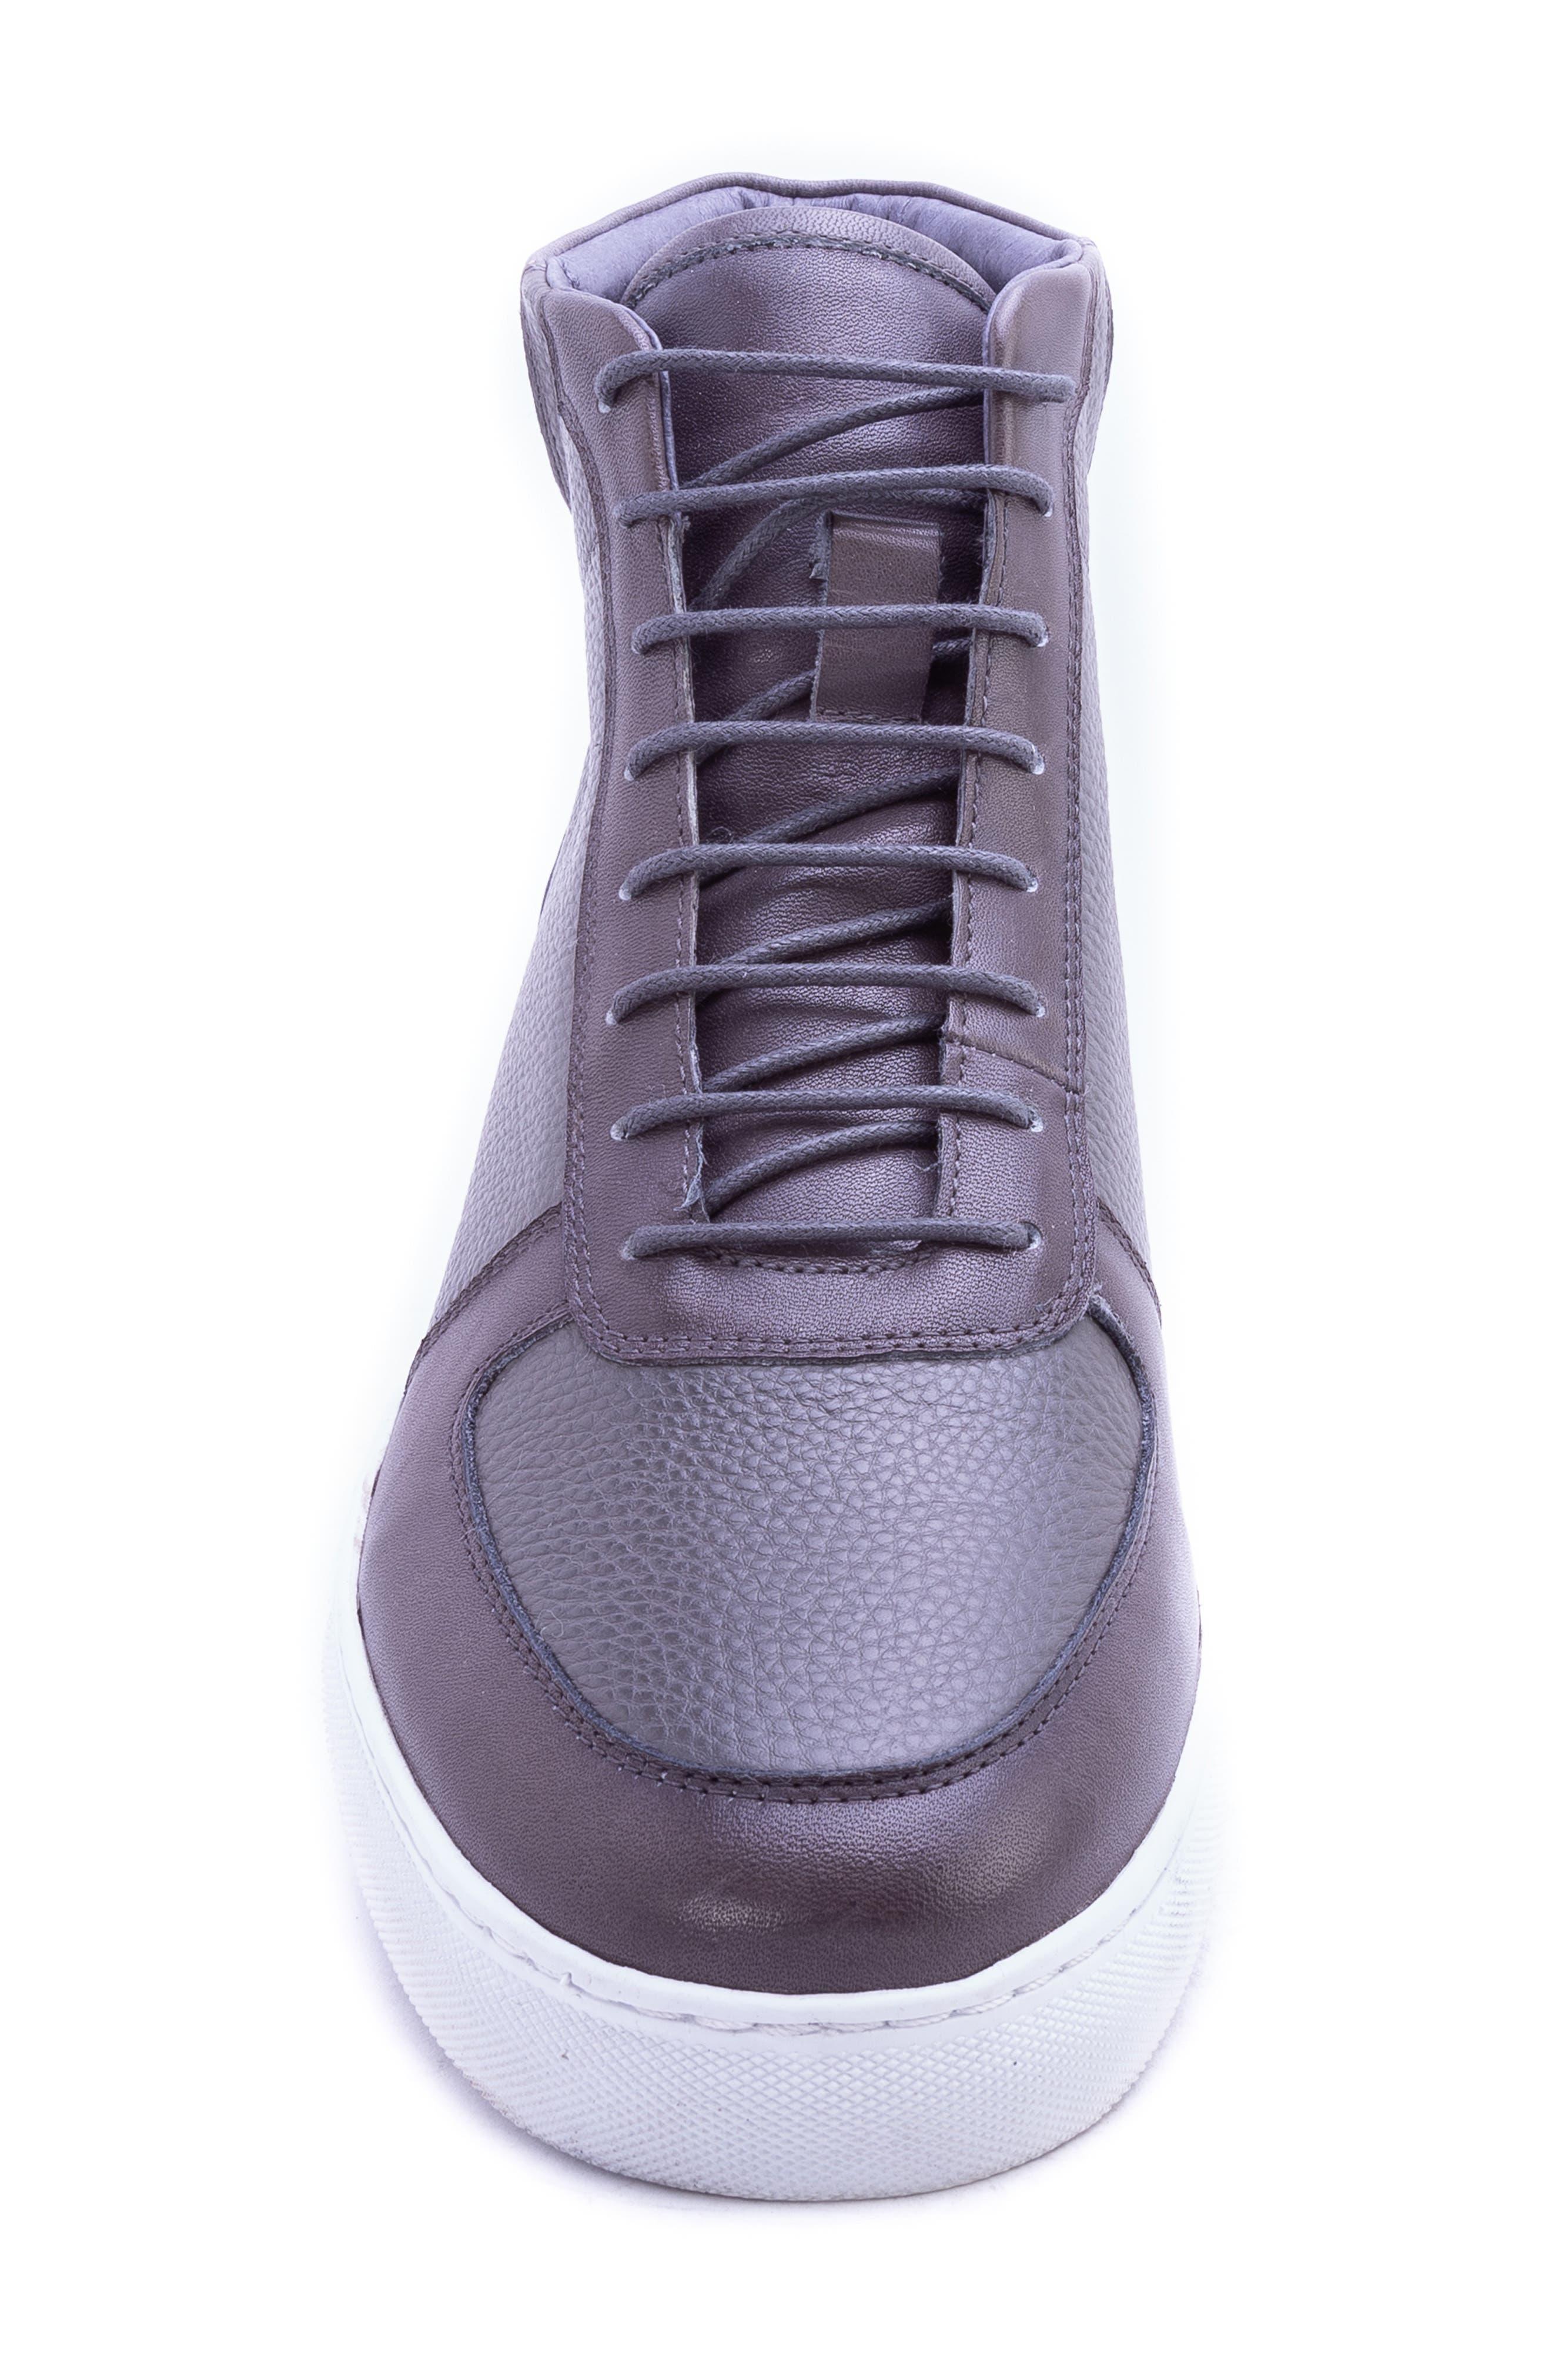 Tassel High Top Sneaker,                             Alternate thumbnail 4, color,                             GREY LEATHER